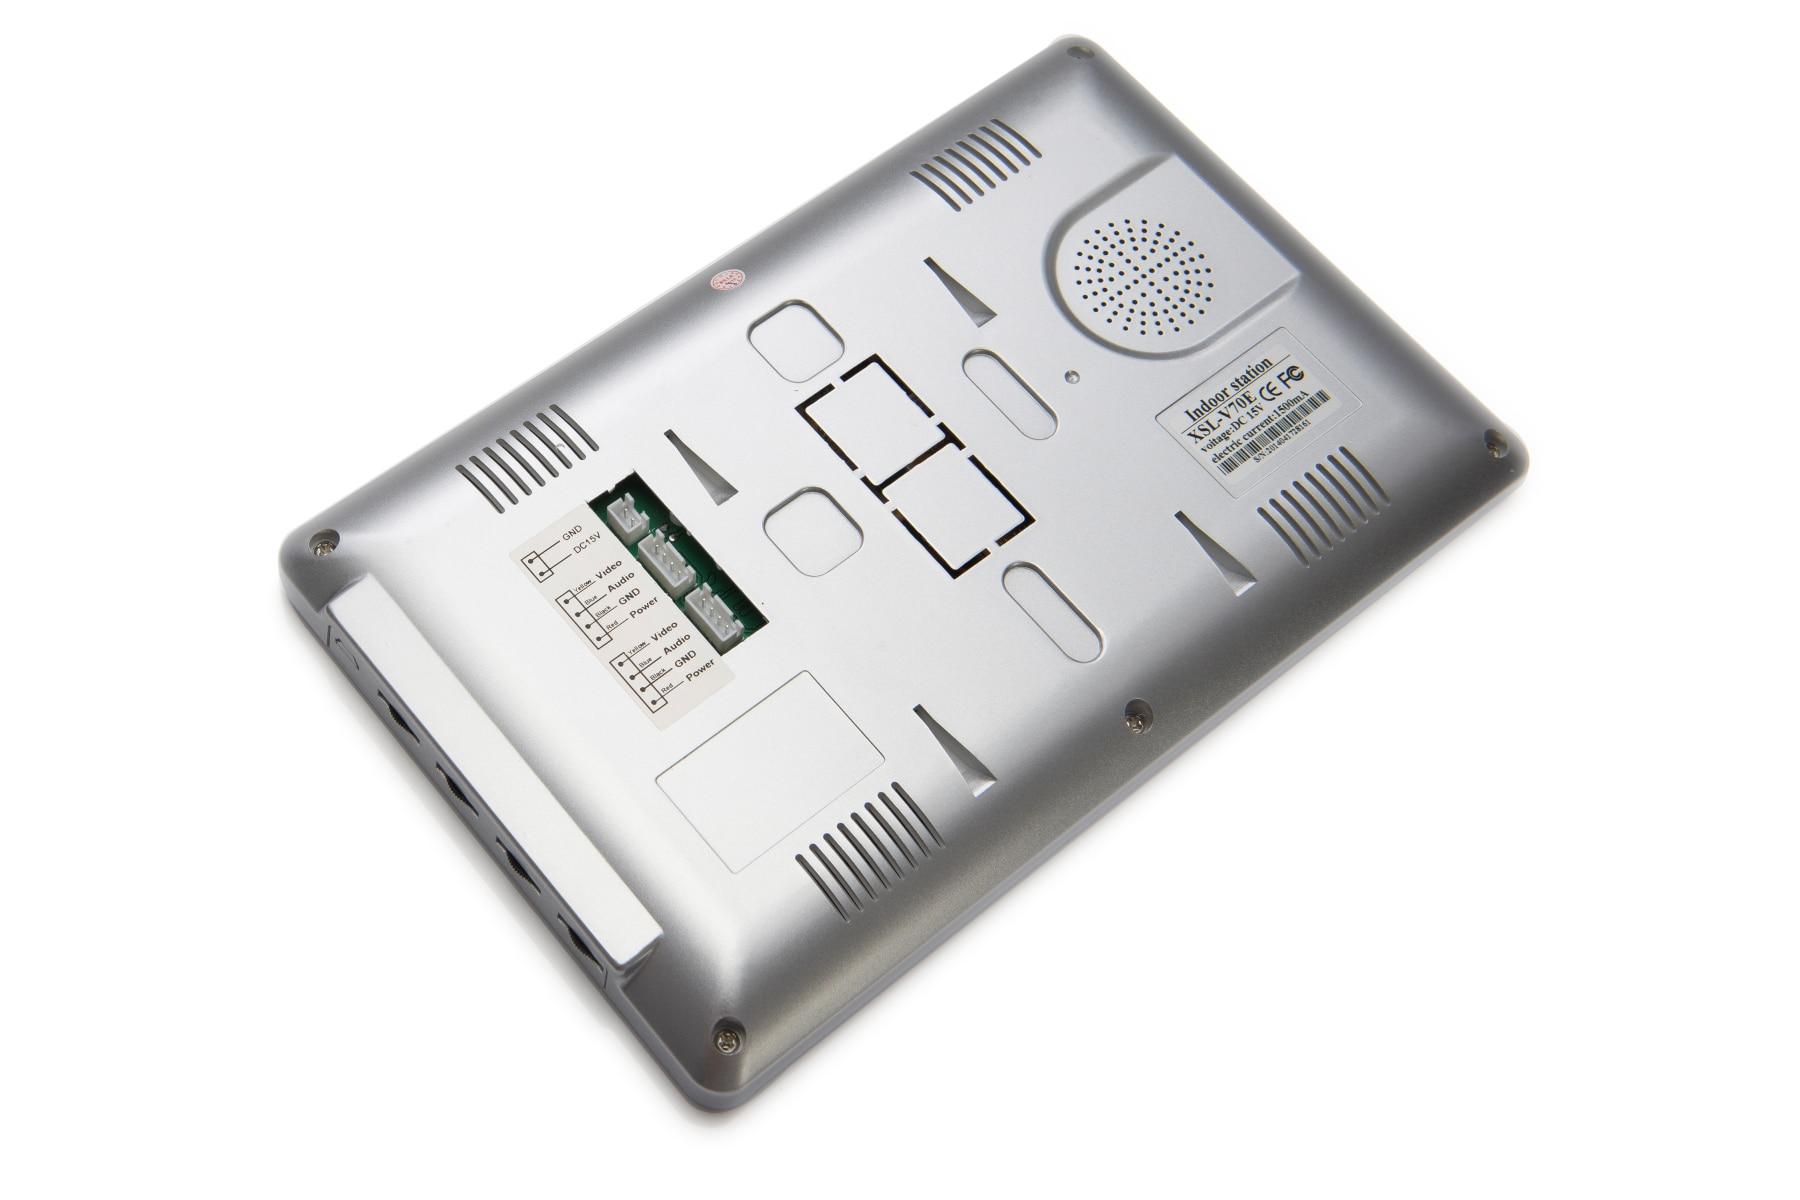 7 Inch Video Doorbell Intercom Door Bell with Camera and Monitor Doorphone System Night Vision for Villa Apartment enlarge